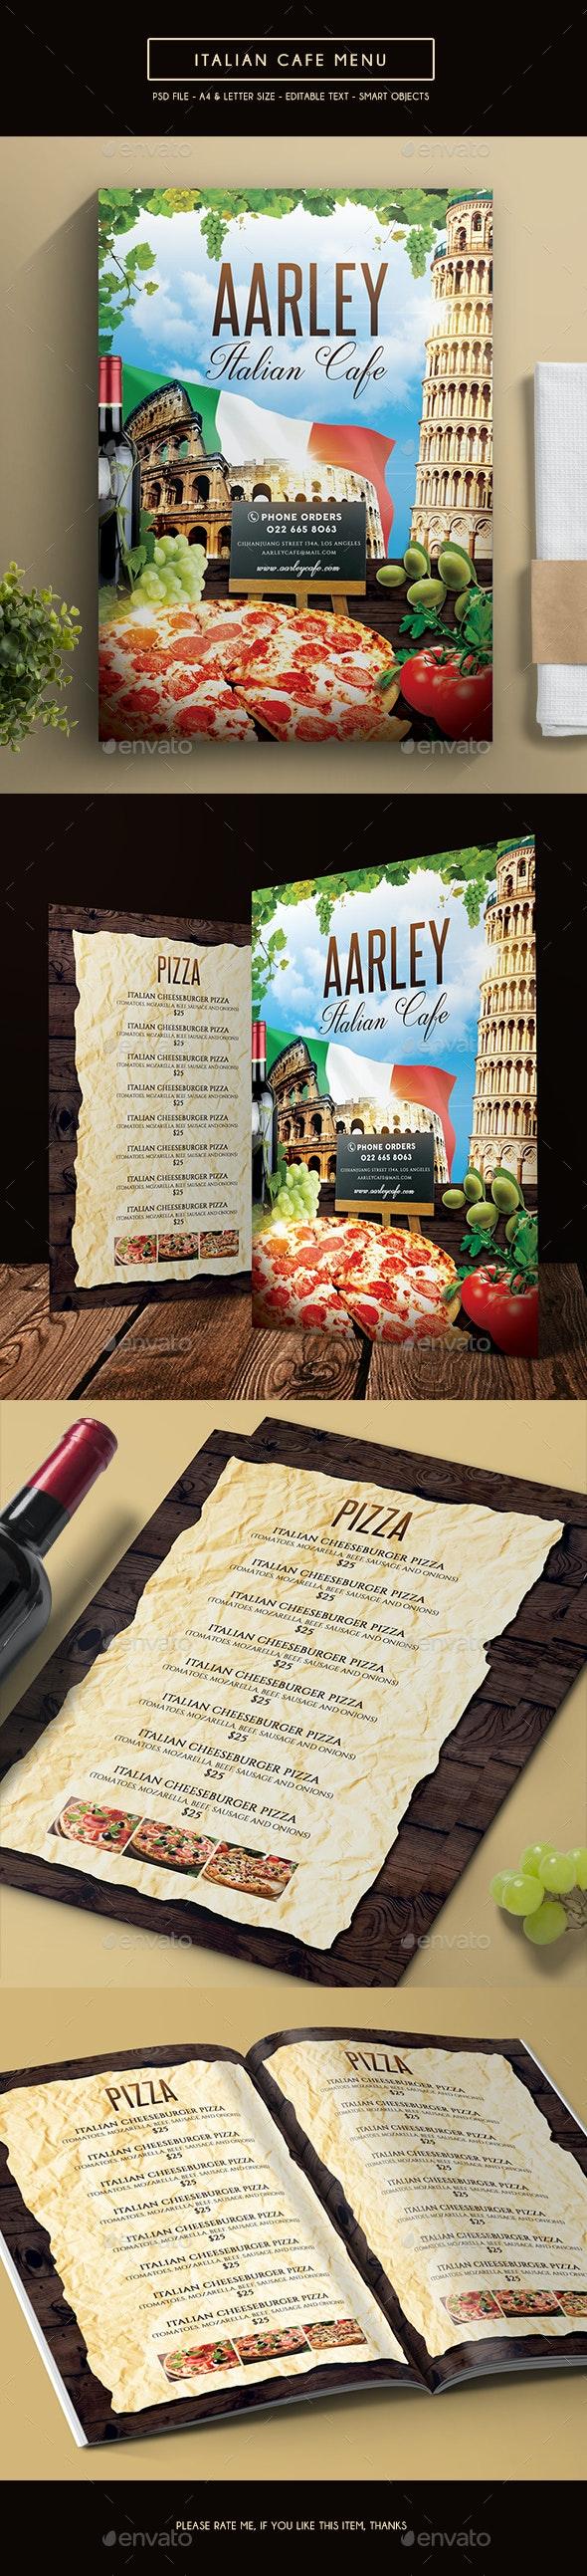 Italian Cafe Menu - Food Menus Print Templates